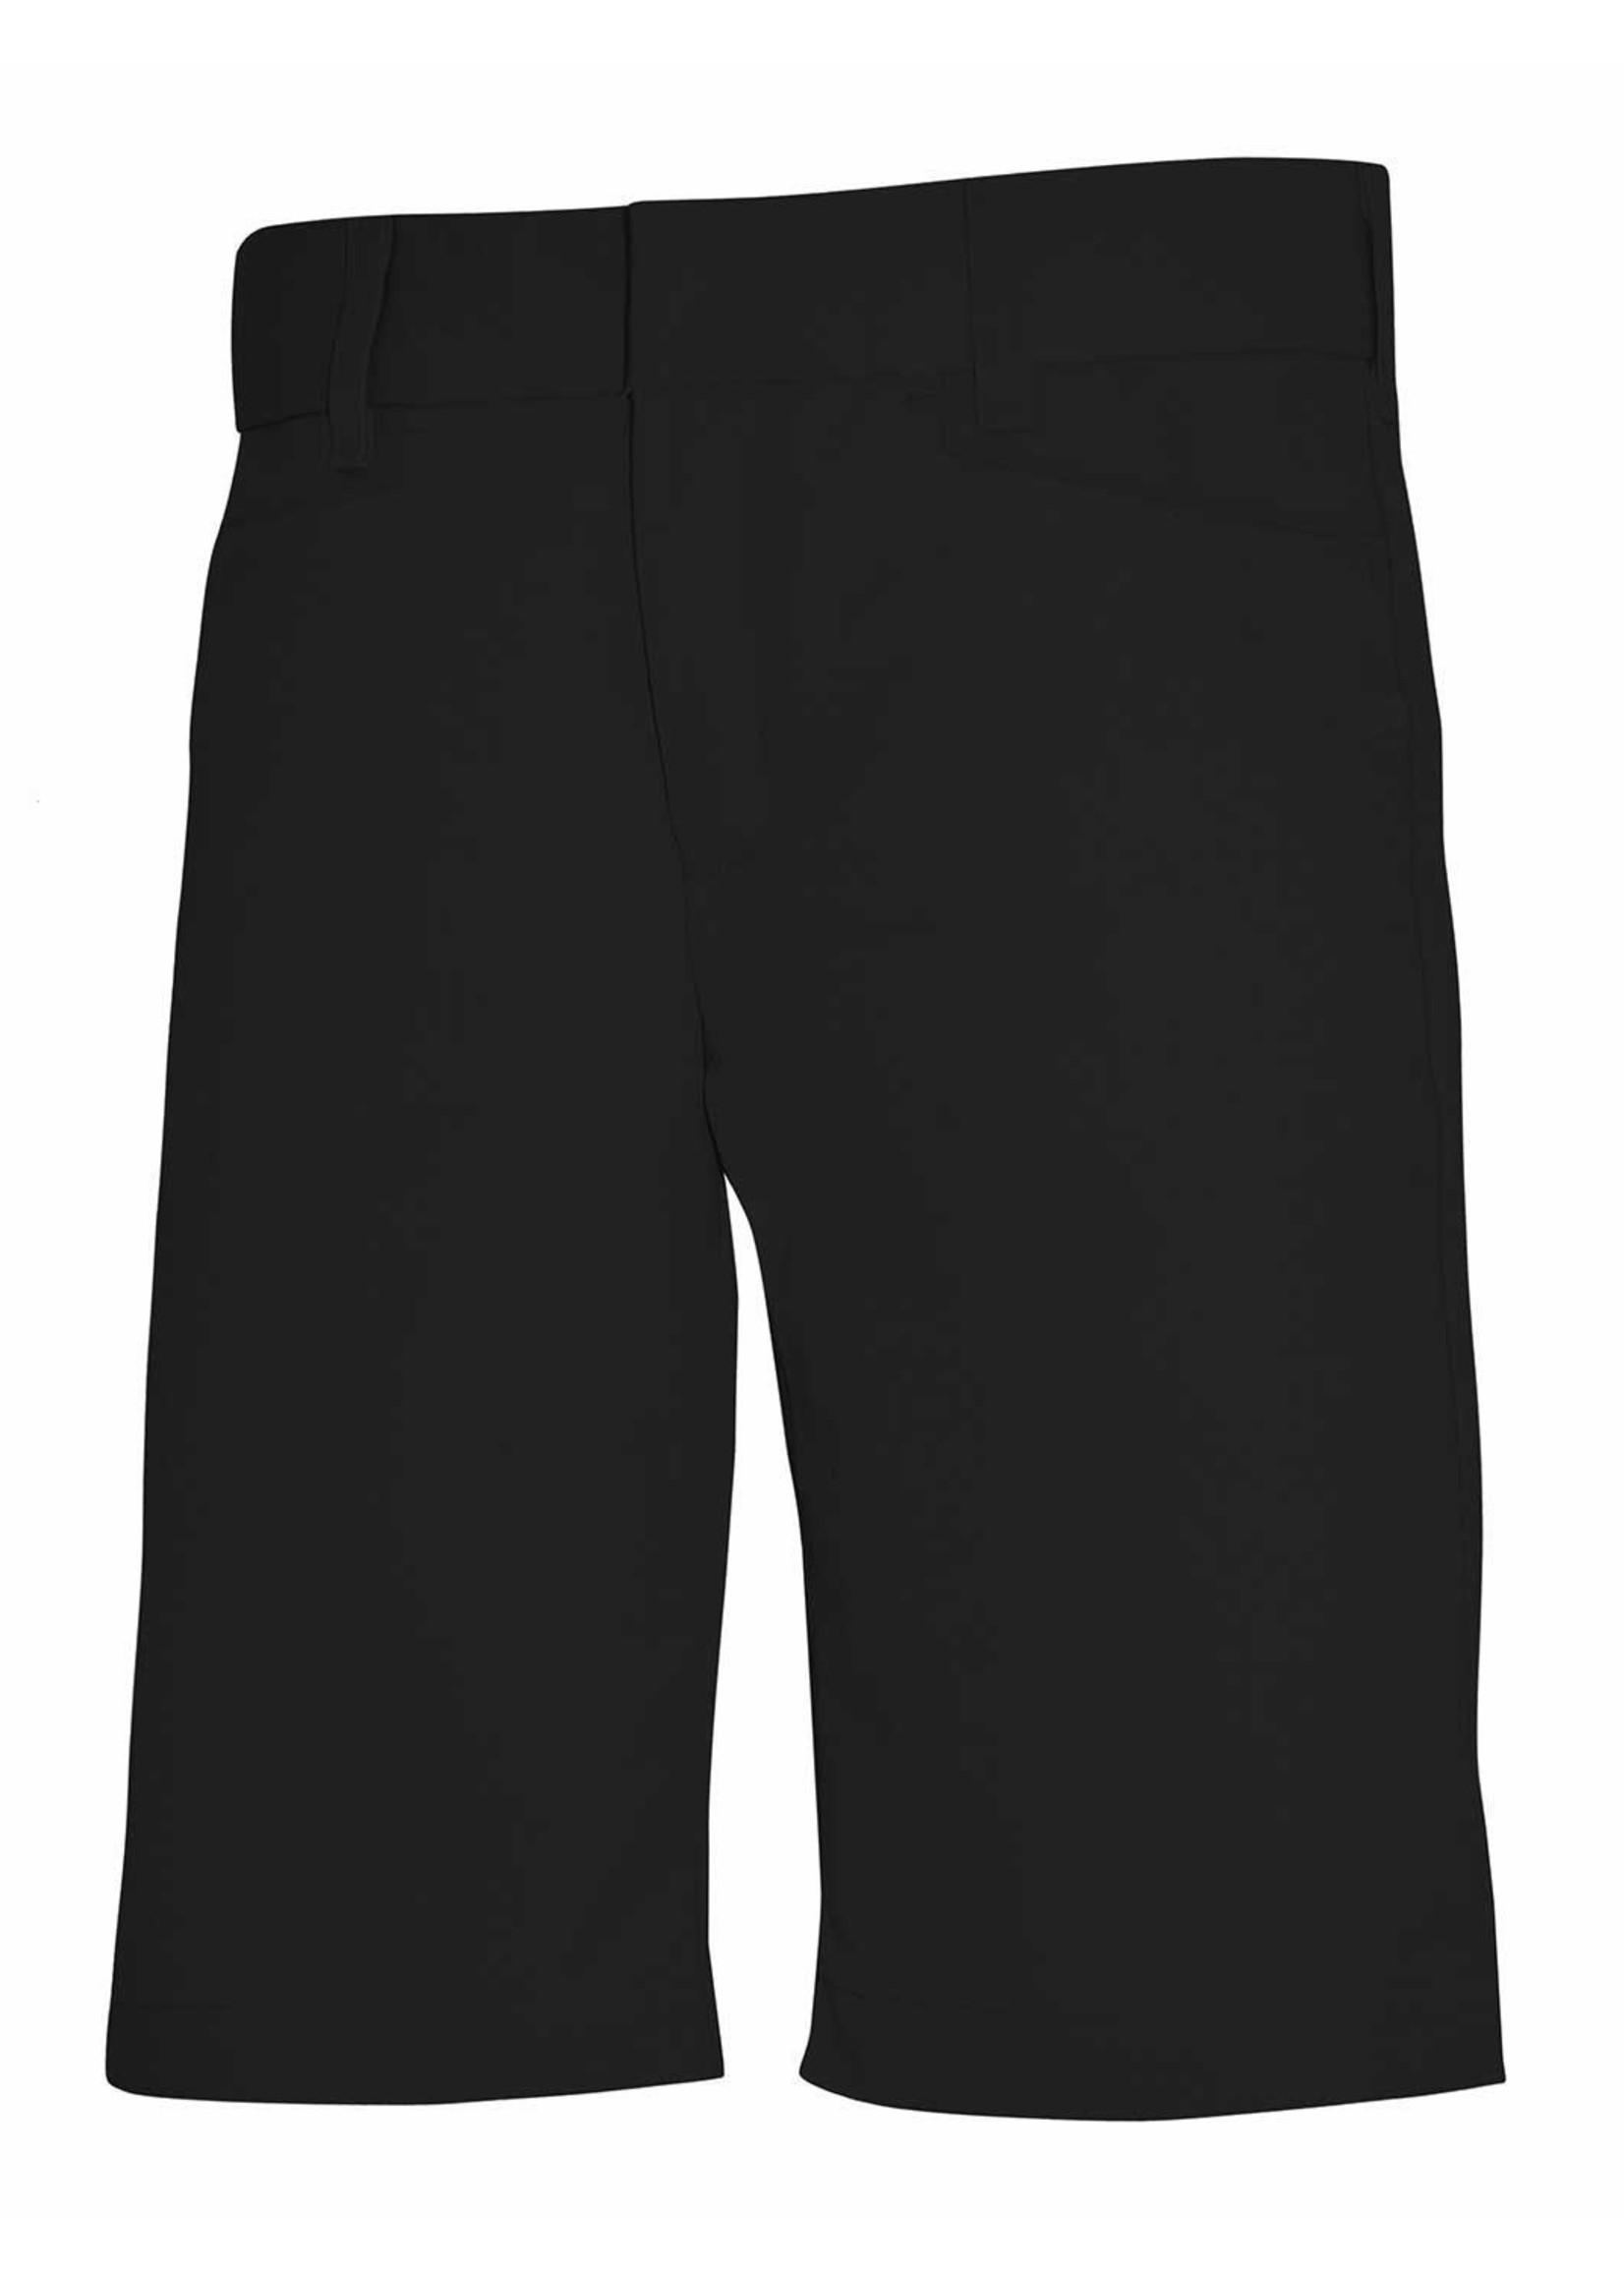 Girls Black Mid Rise Flat Front Shorts